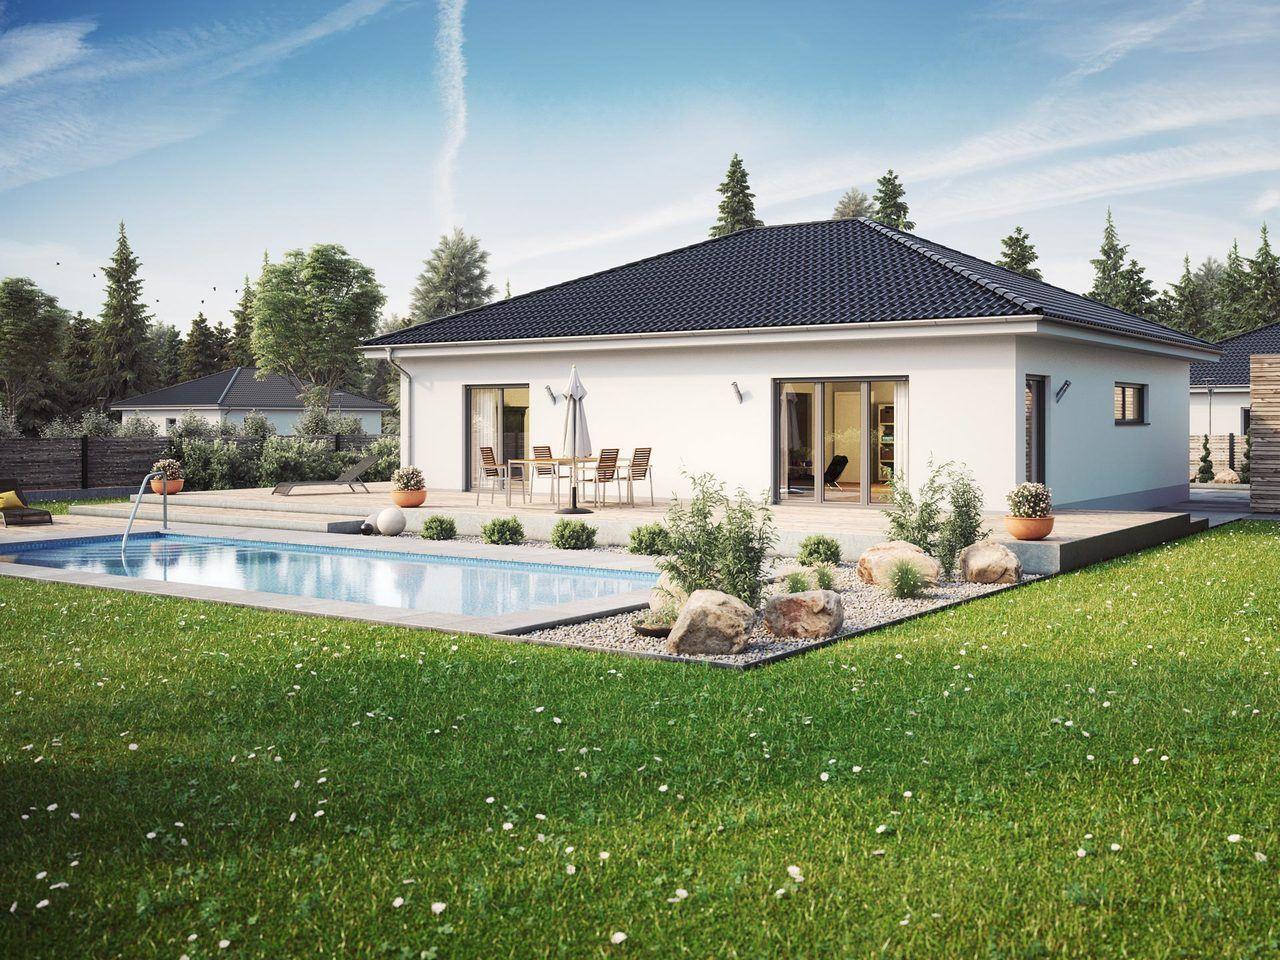 Haus Nizza - Dürr Massivhaus